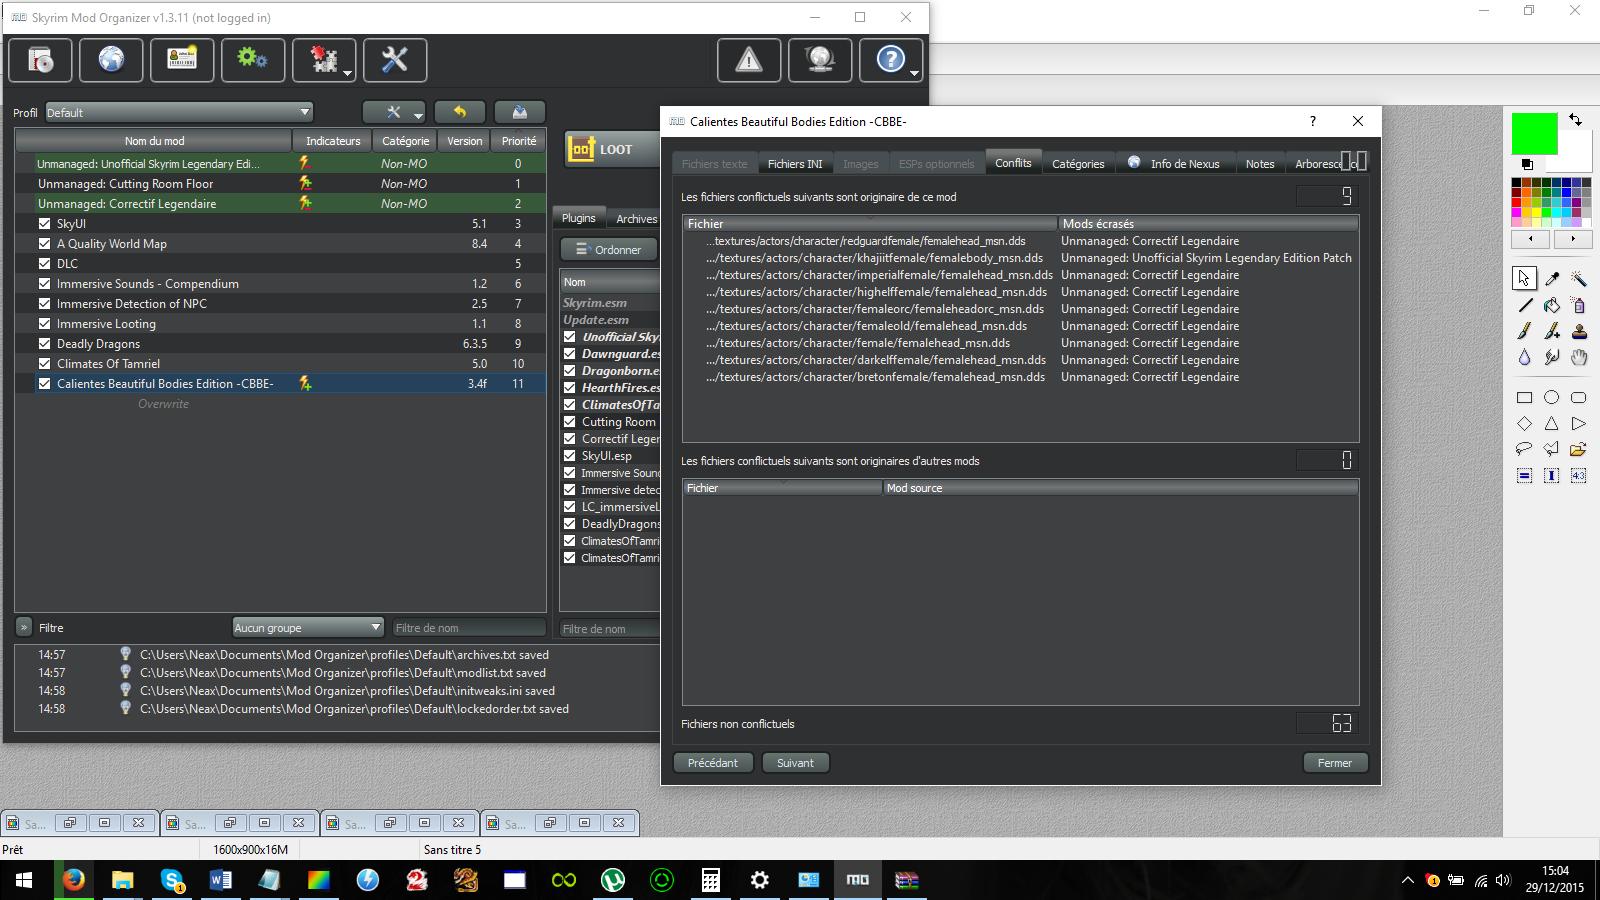 Perma patcher mod organizer installation